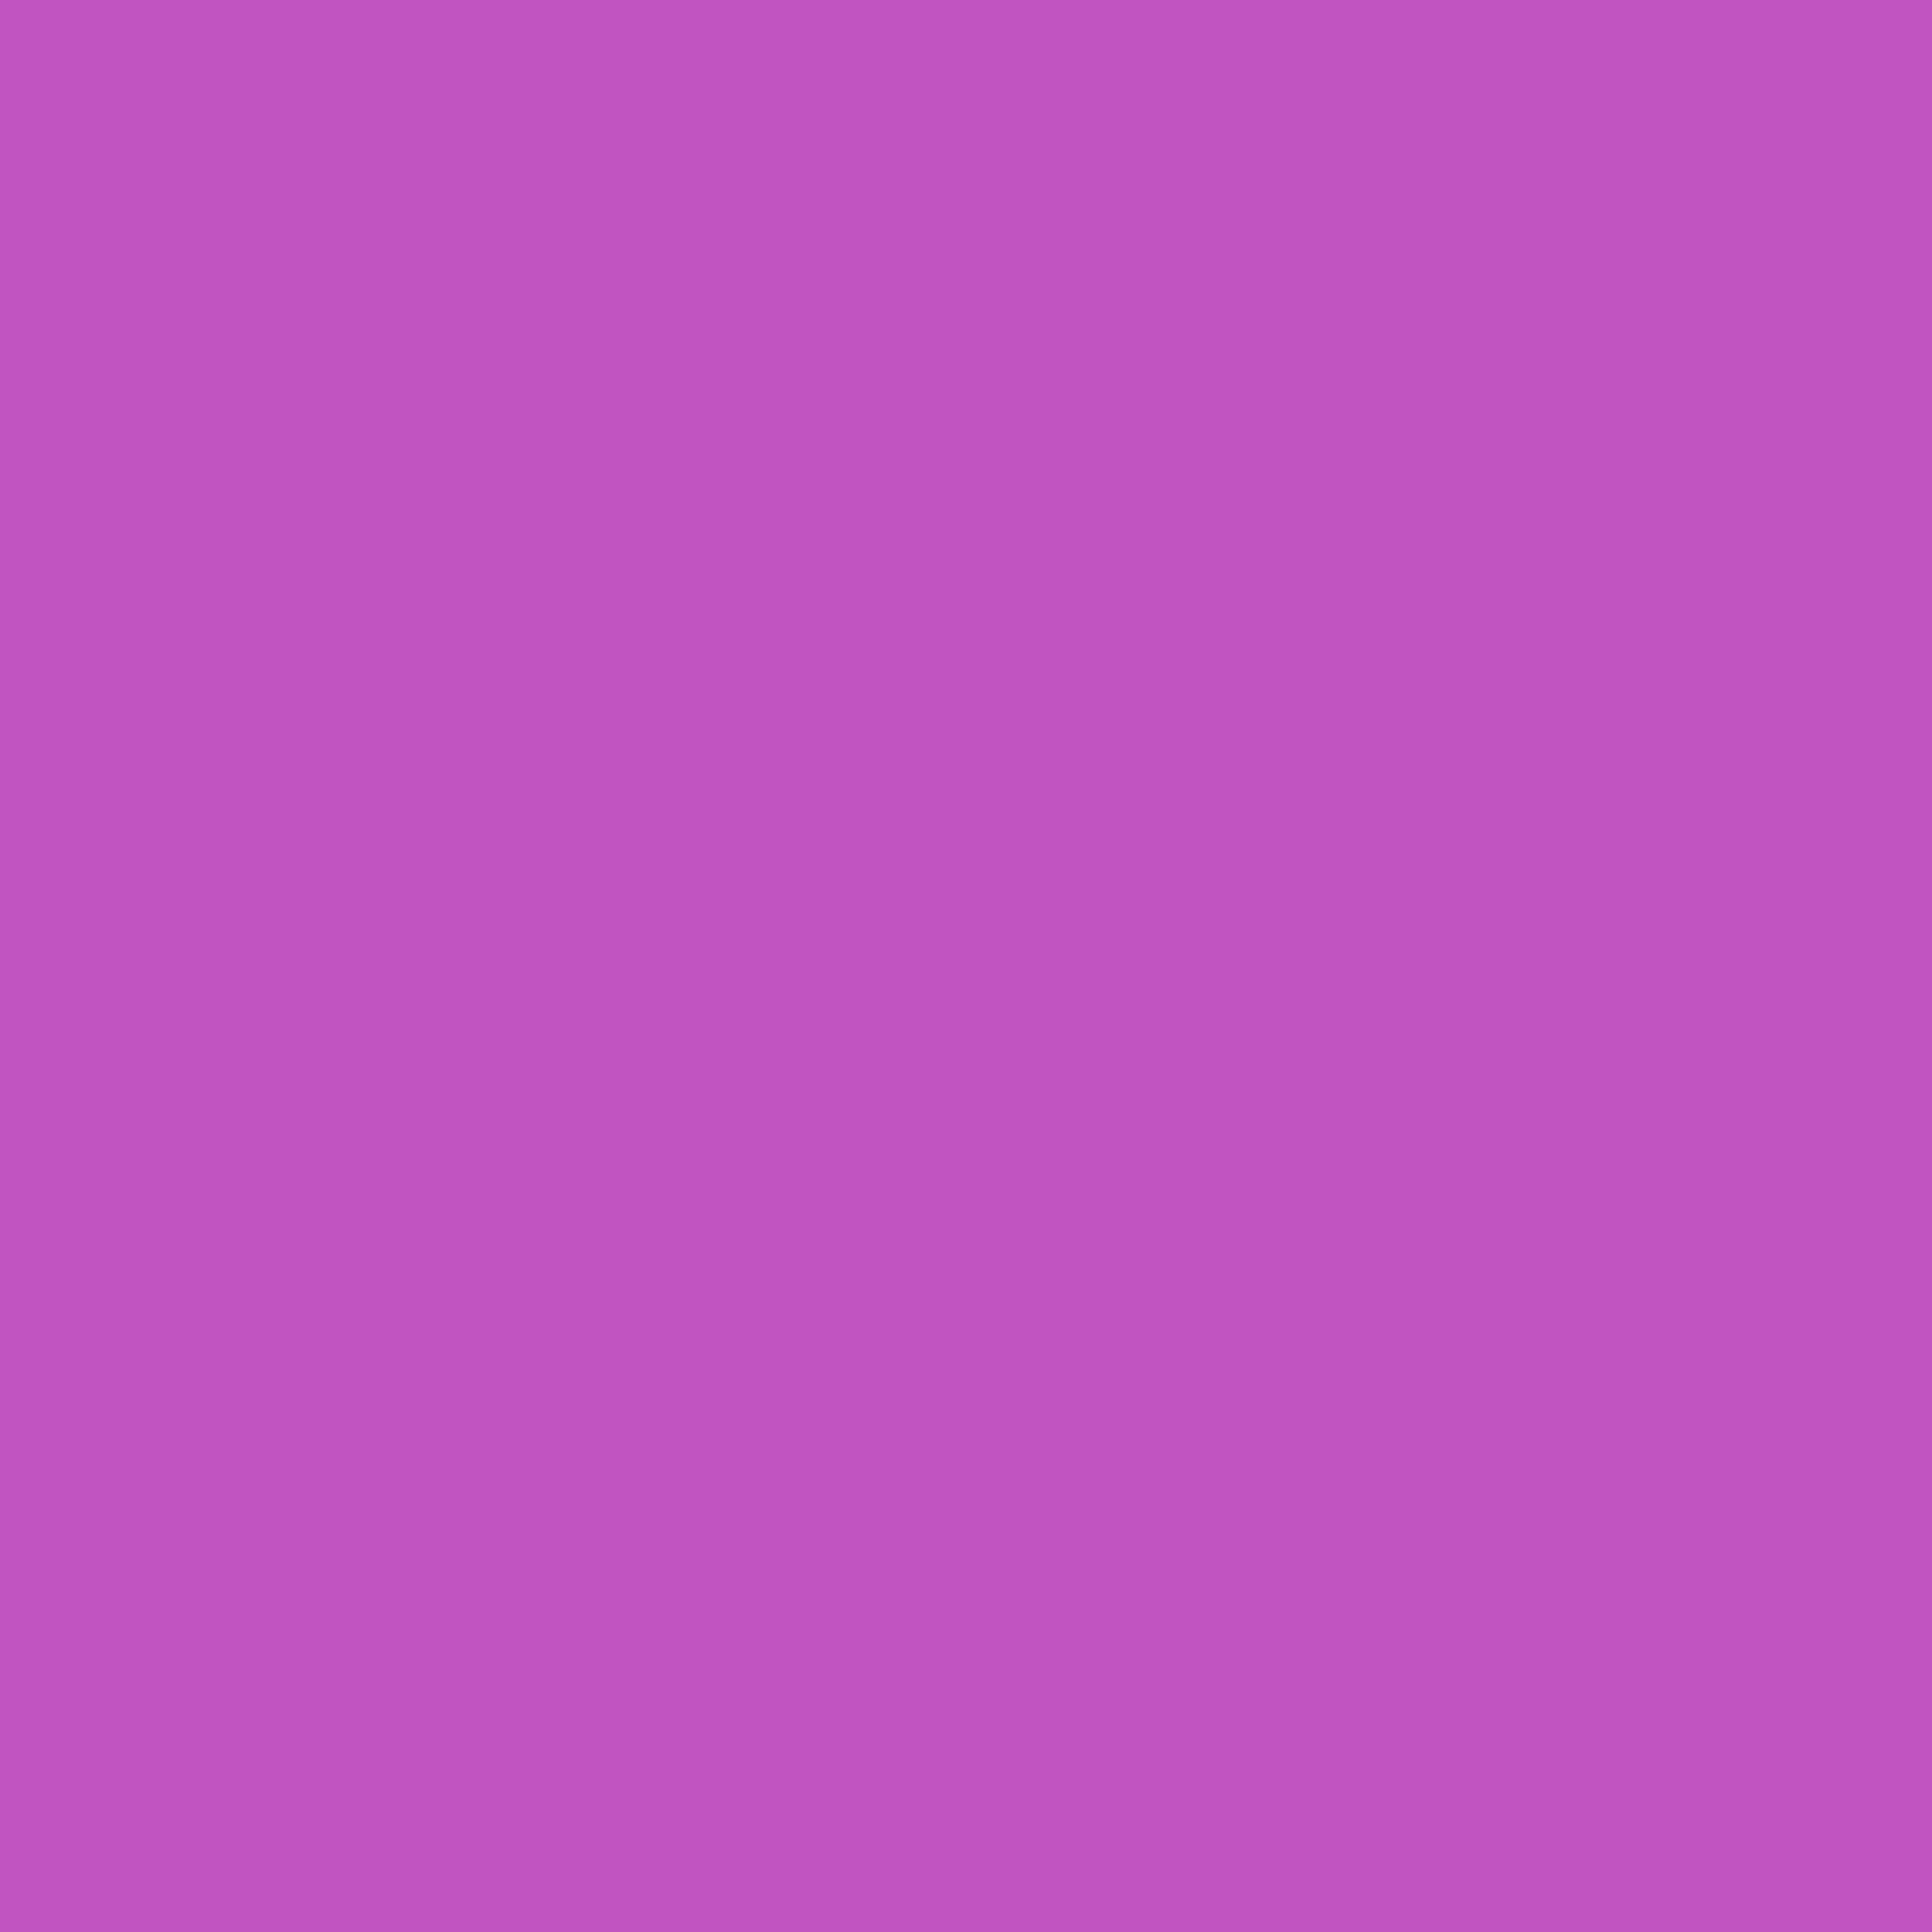 2048x2048 Fuchsia Crayola Solid Color Background